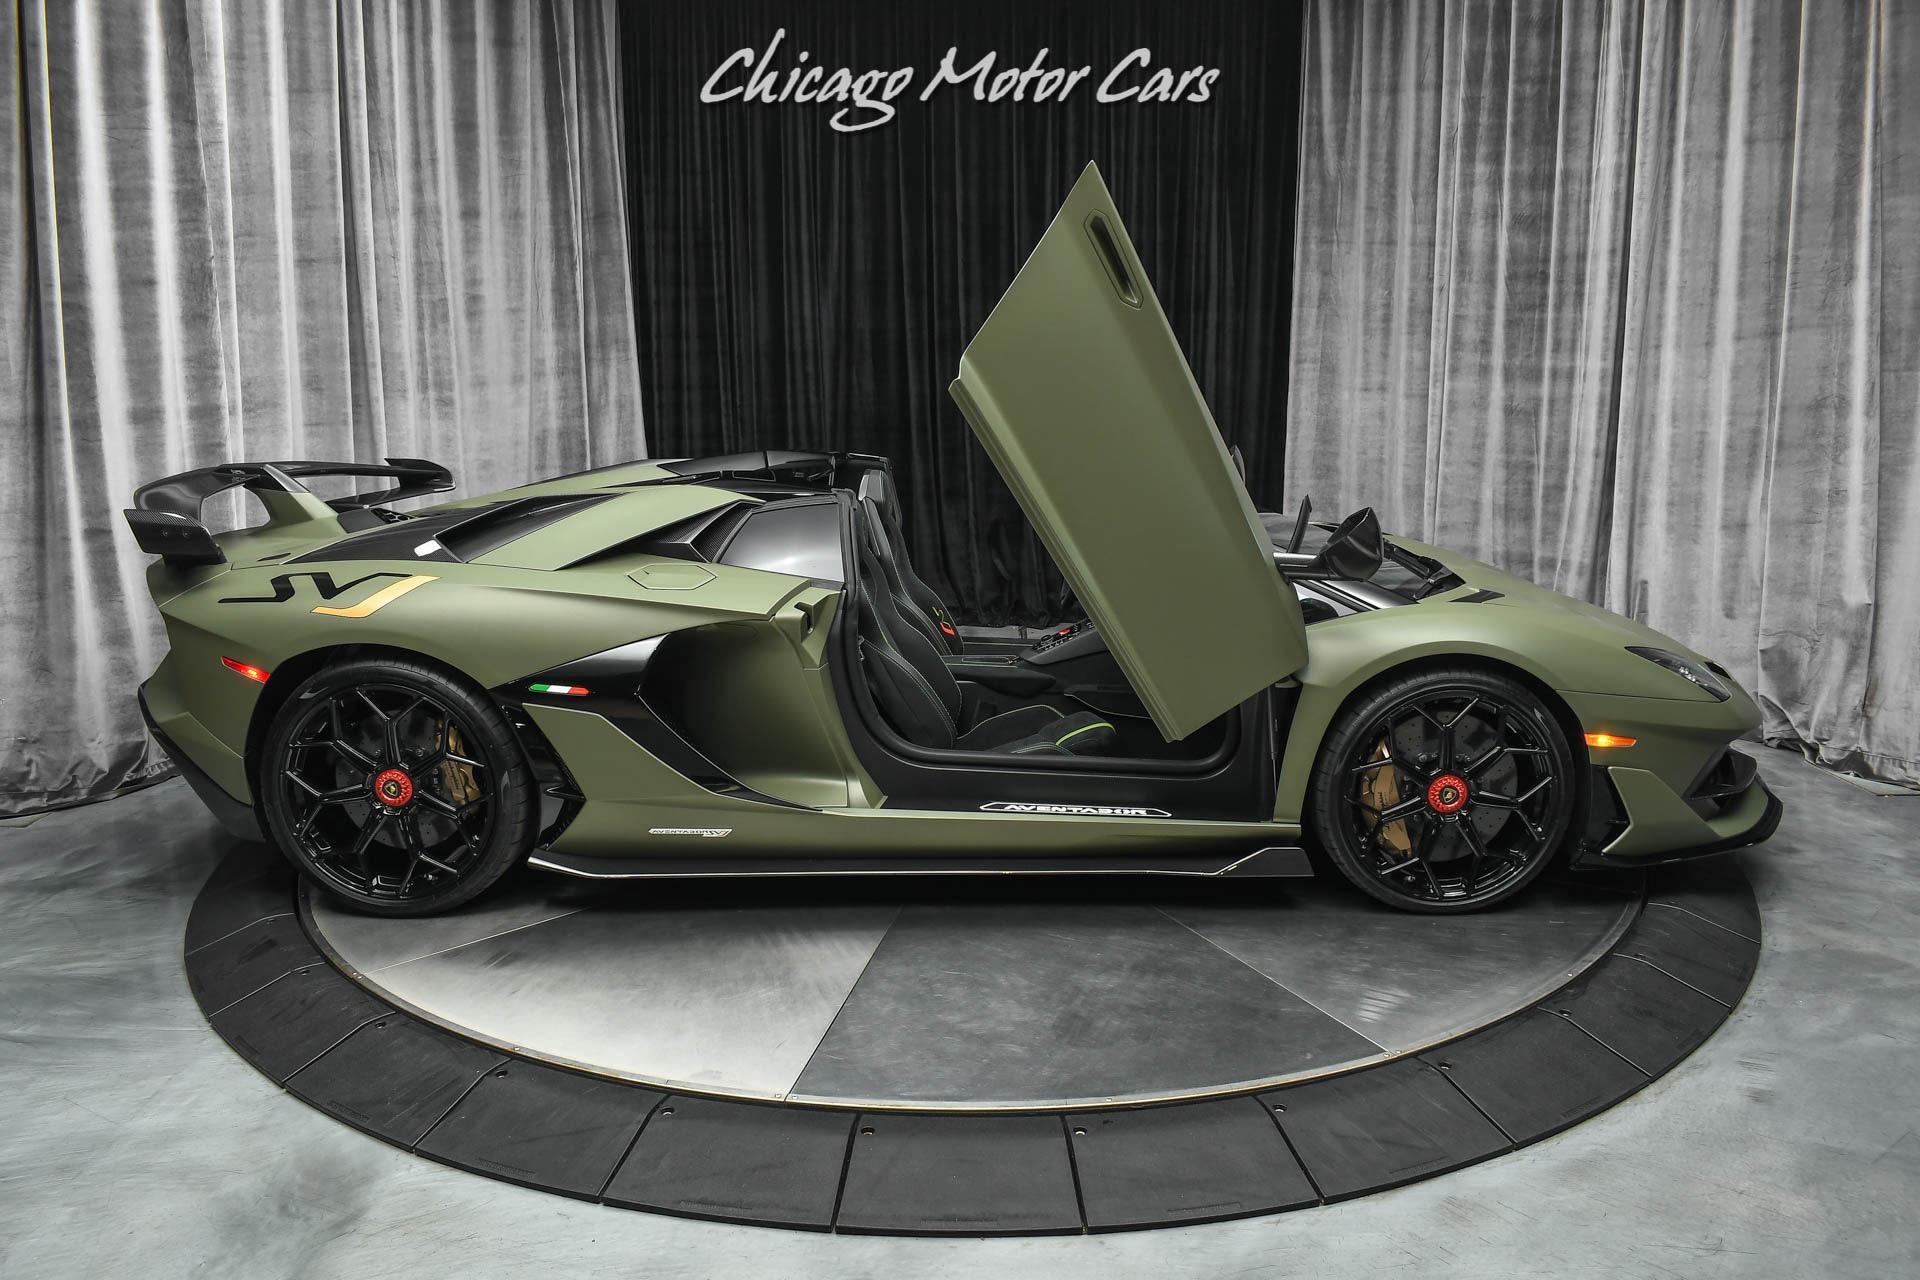 Used-2020-Lamborghini-Aventador-LP770-4-SVJ-Roadster-RARE-Paint-LOADED-Carbon-Fiber-FULL-Ad-Personam